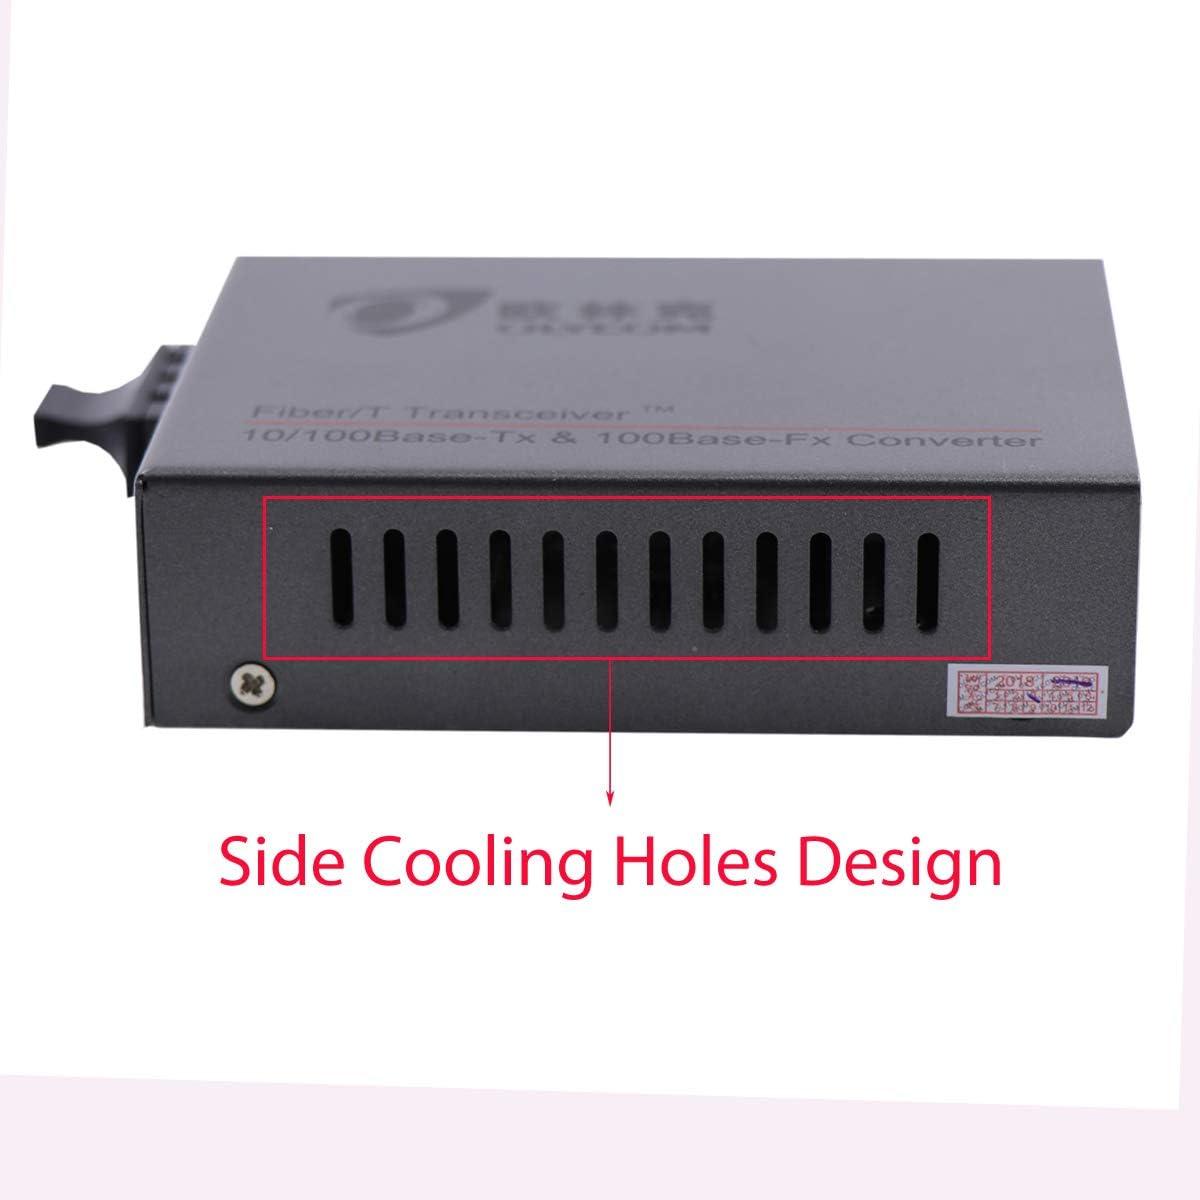 10//100Mbps Rate RJ45 to Optic Fiber SC Ethernet Media Converter Single Mode Double-Core CAT5 Transceiver 20km 1310nm